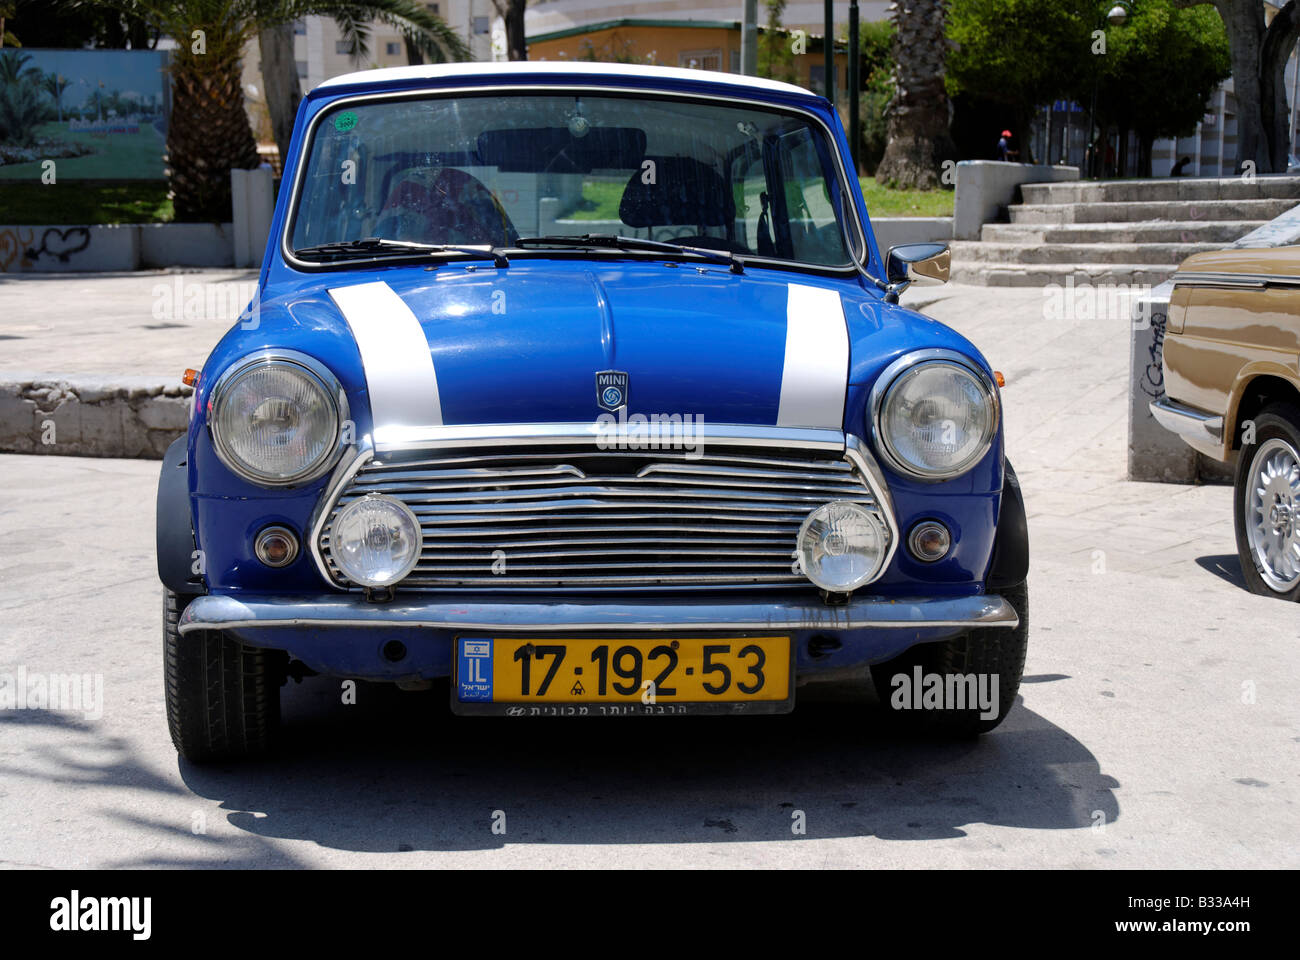 Old Classic Volkswagen T1 Van Editorial Stock Image ...  Old Blue Mini